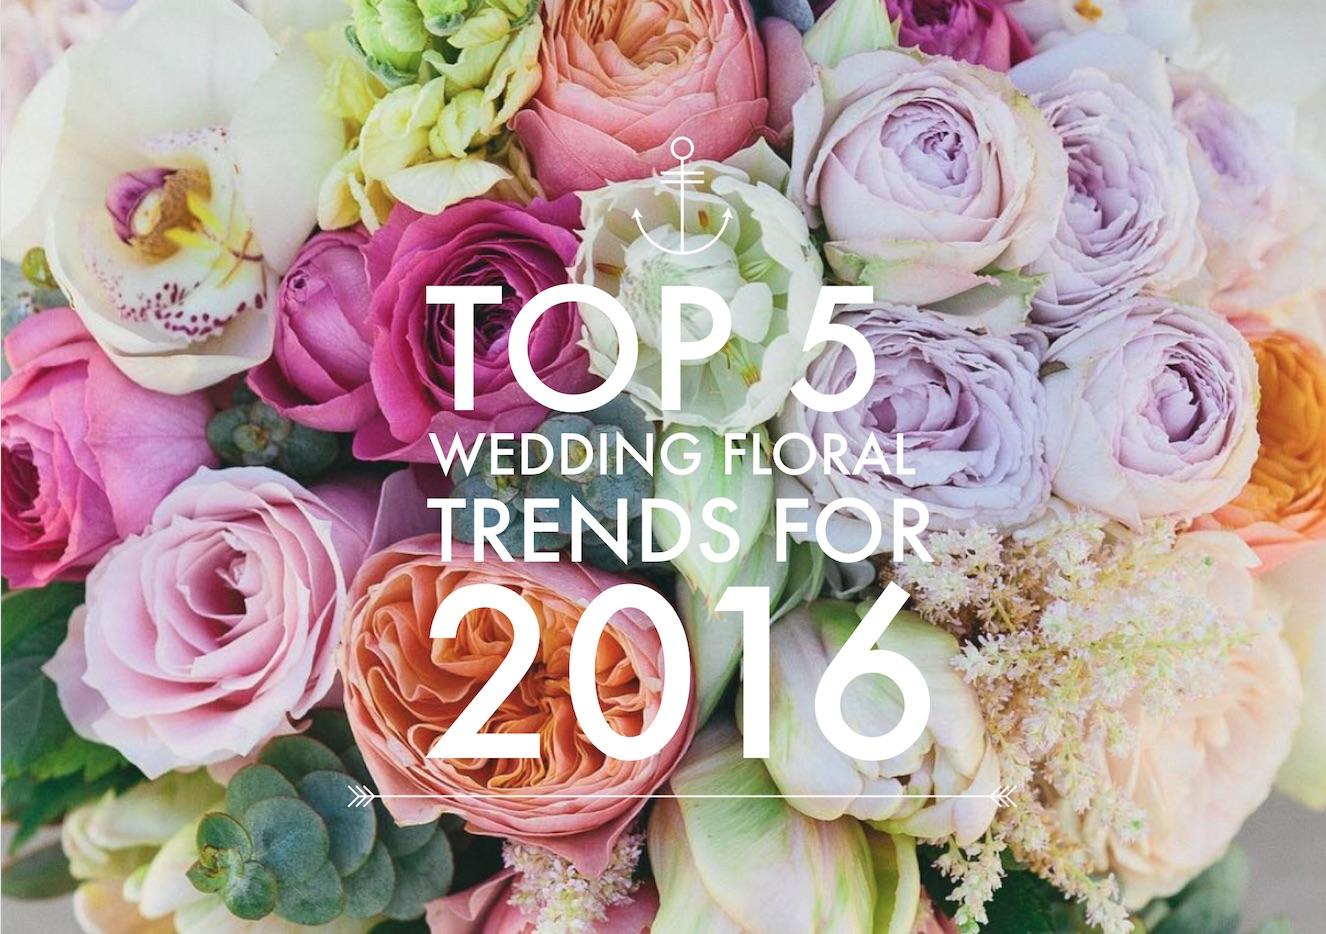 wedding-floral-trends.jpg